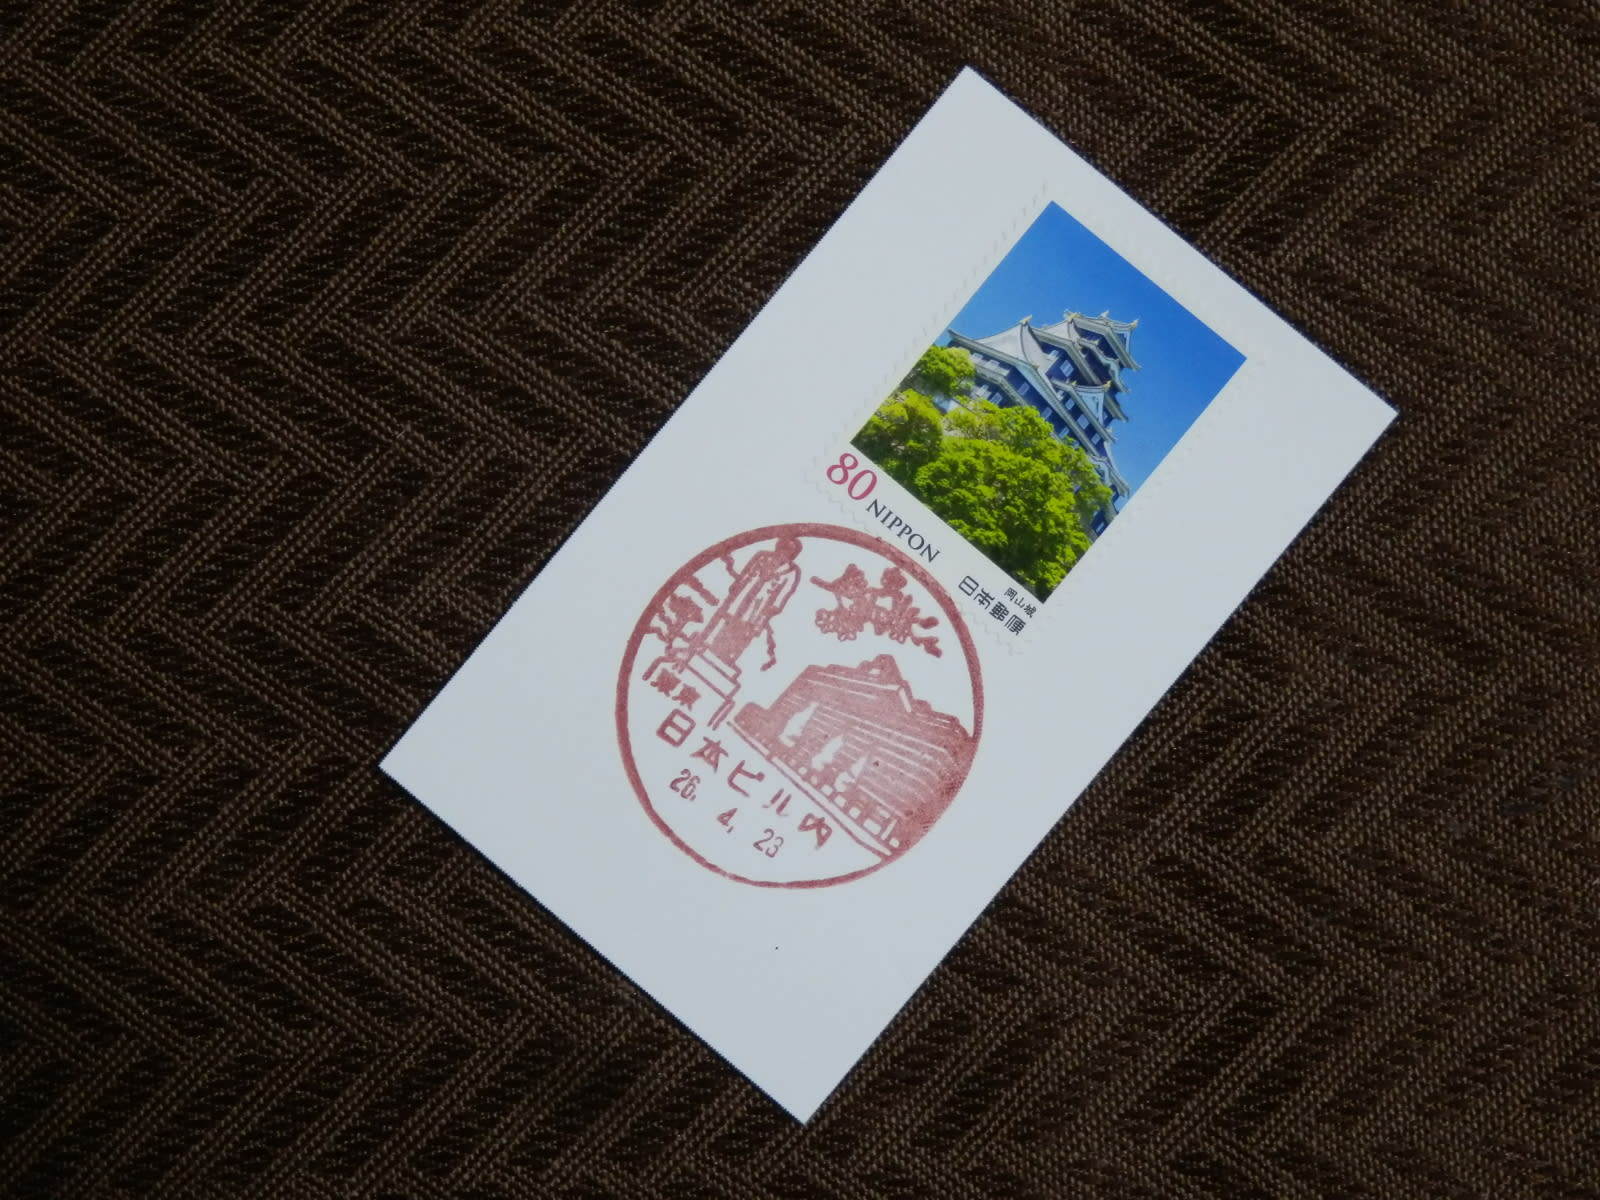 風景印(34):日本ビル内郵便局